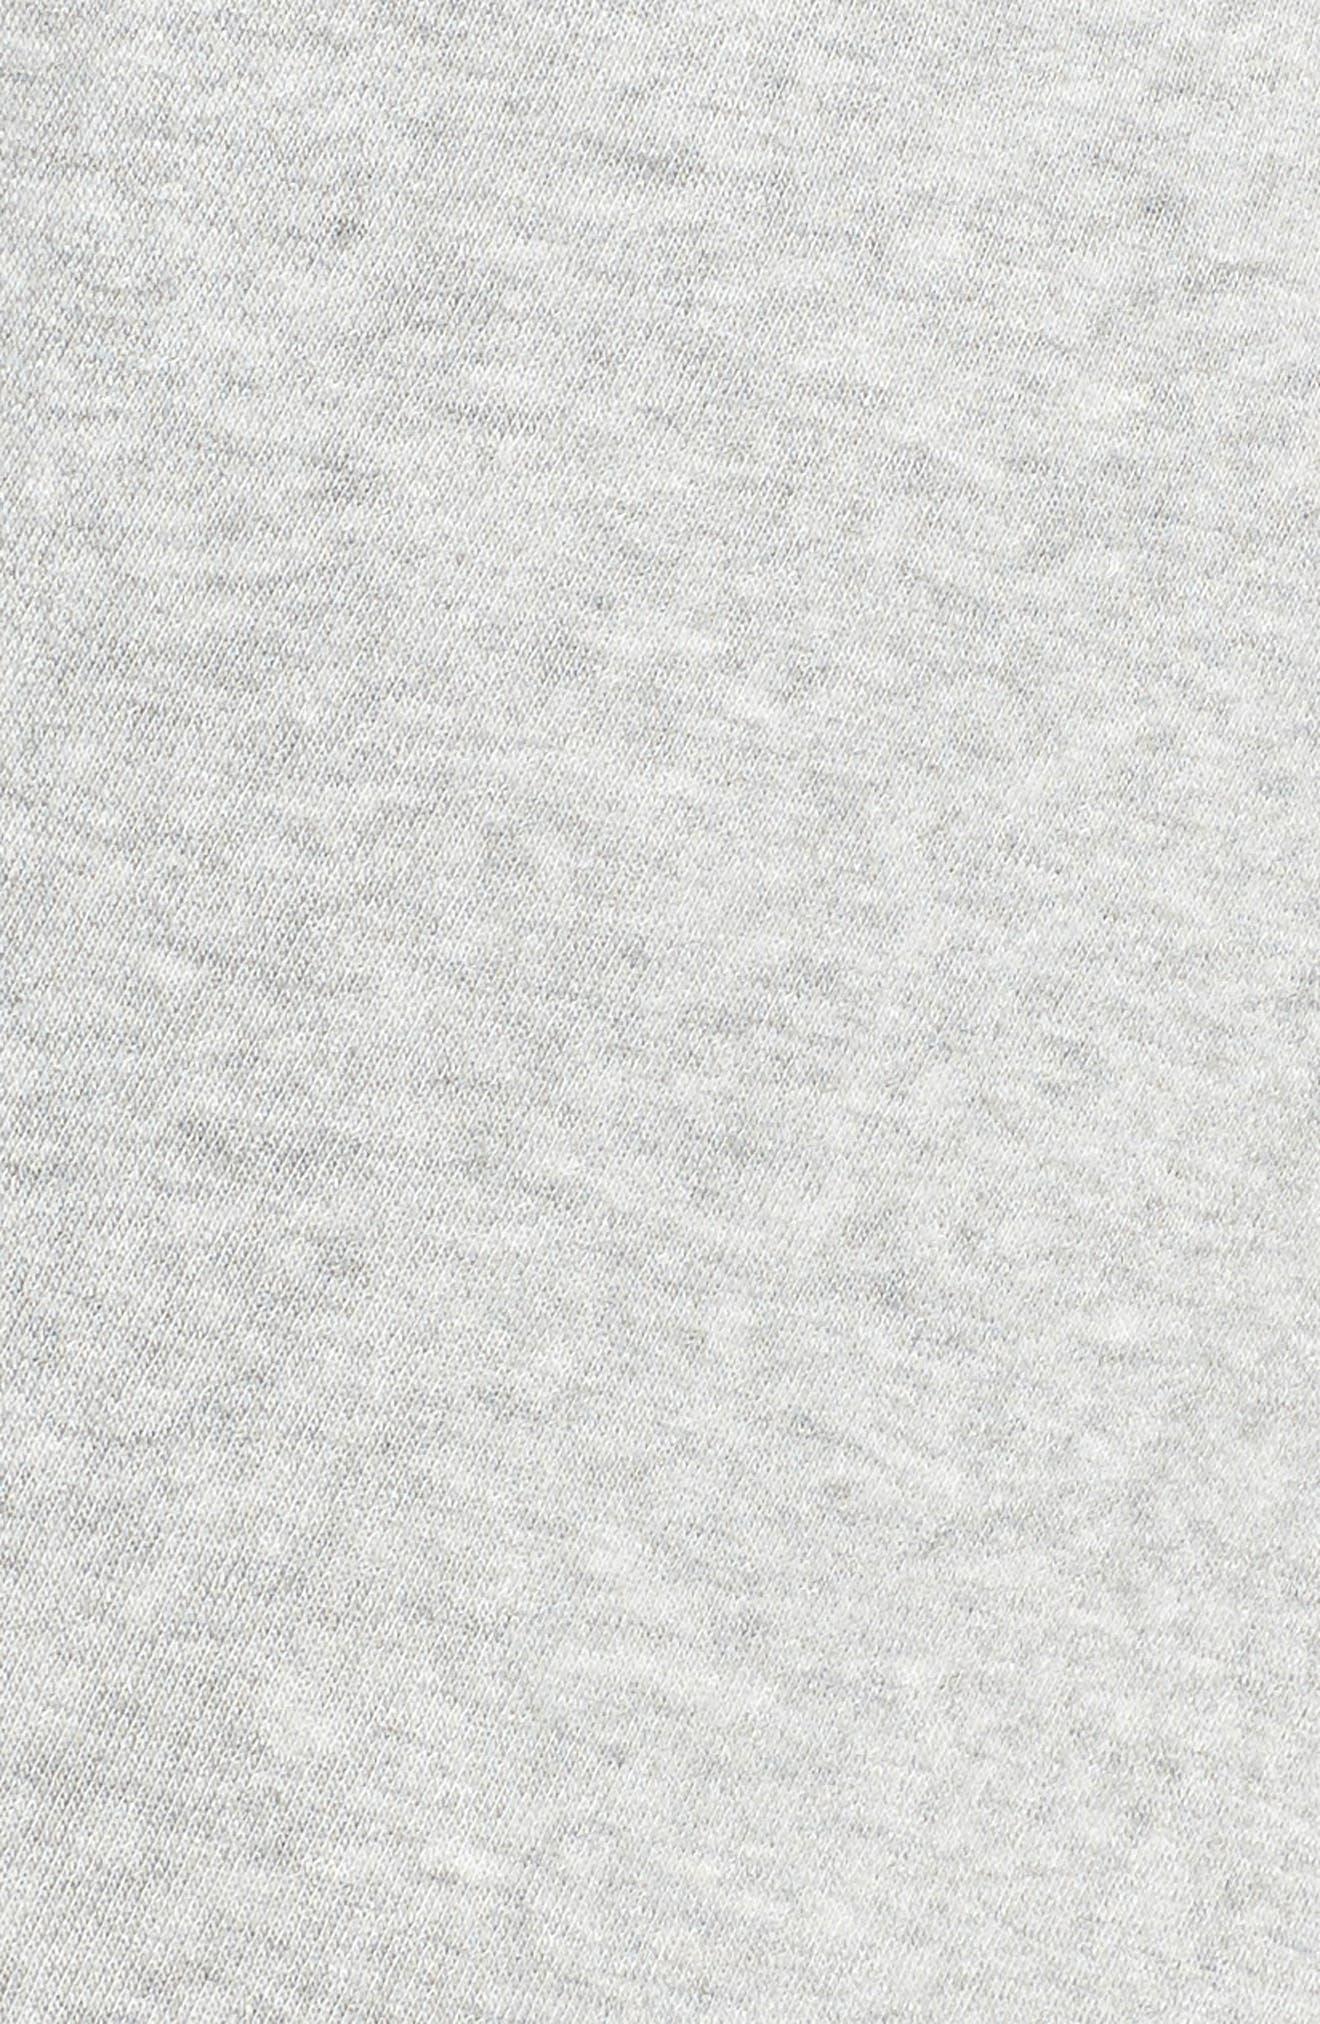 Dreamy Jogger Pants,                             Alternate thumbnail 5, color,                             GREY HEATHER